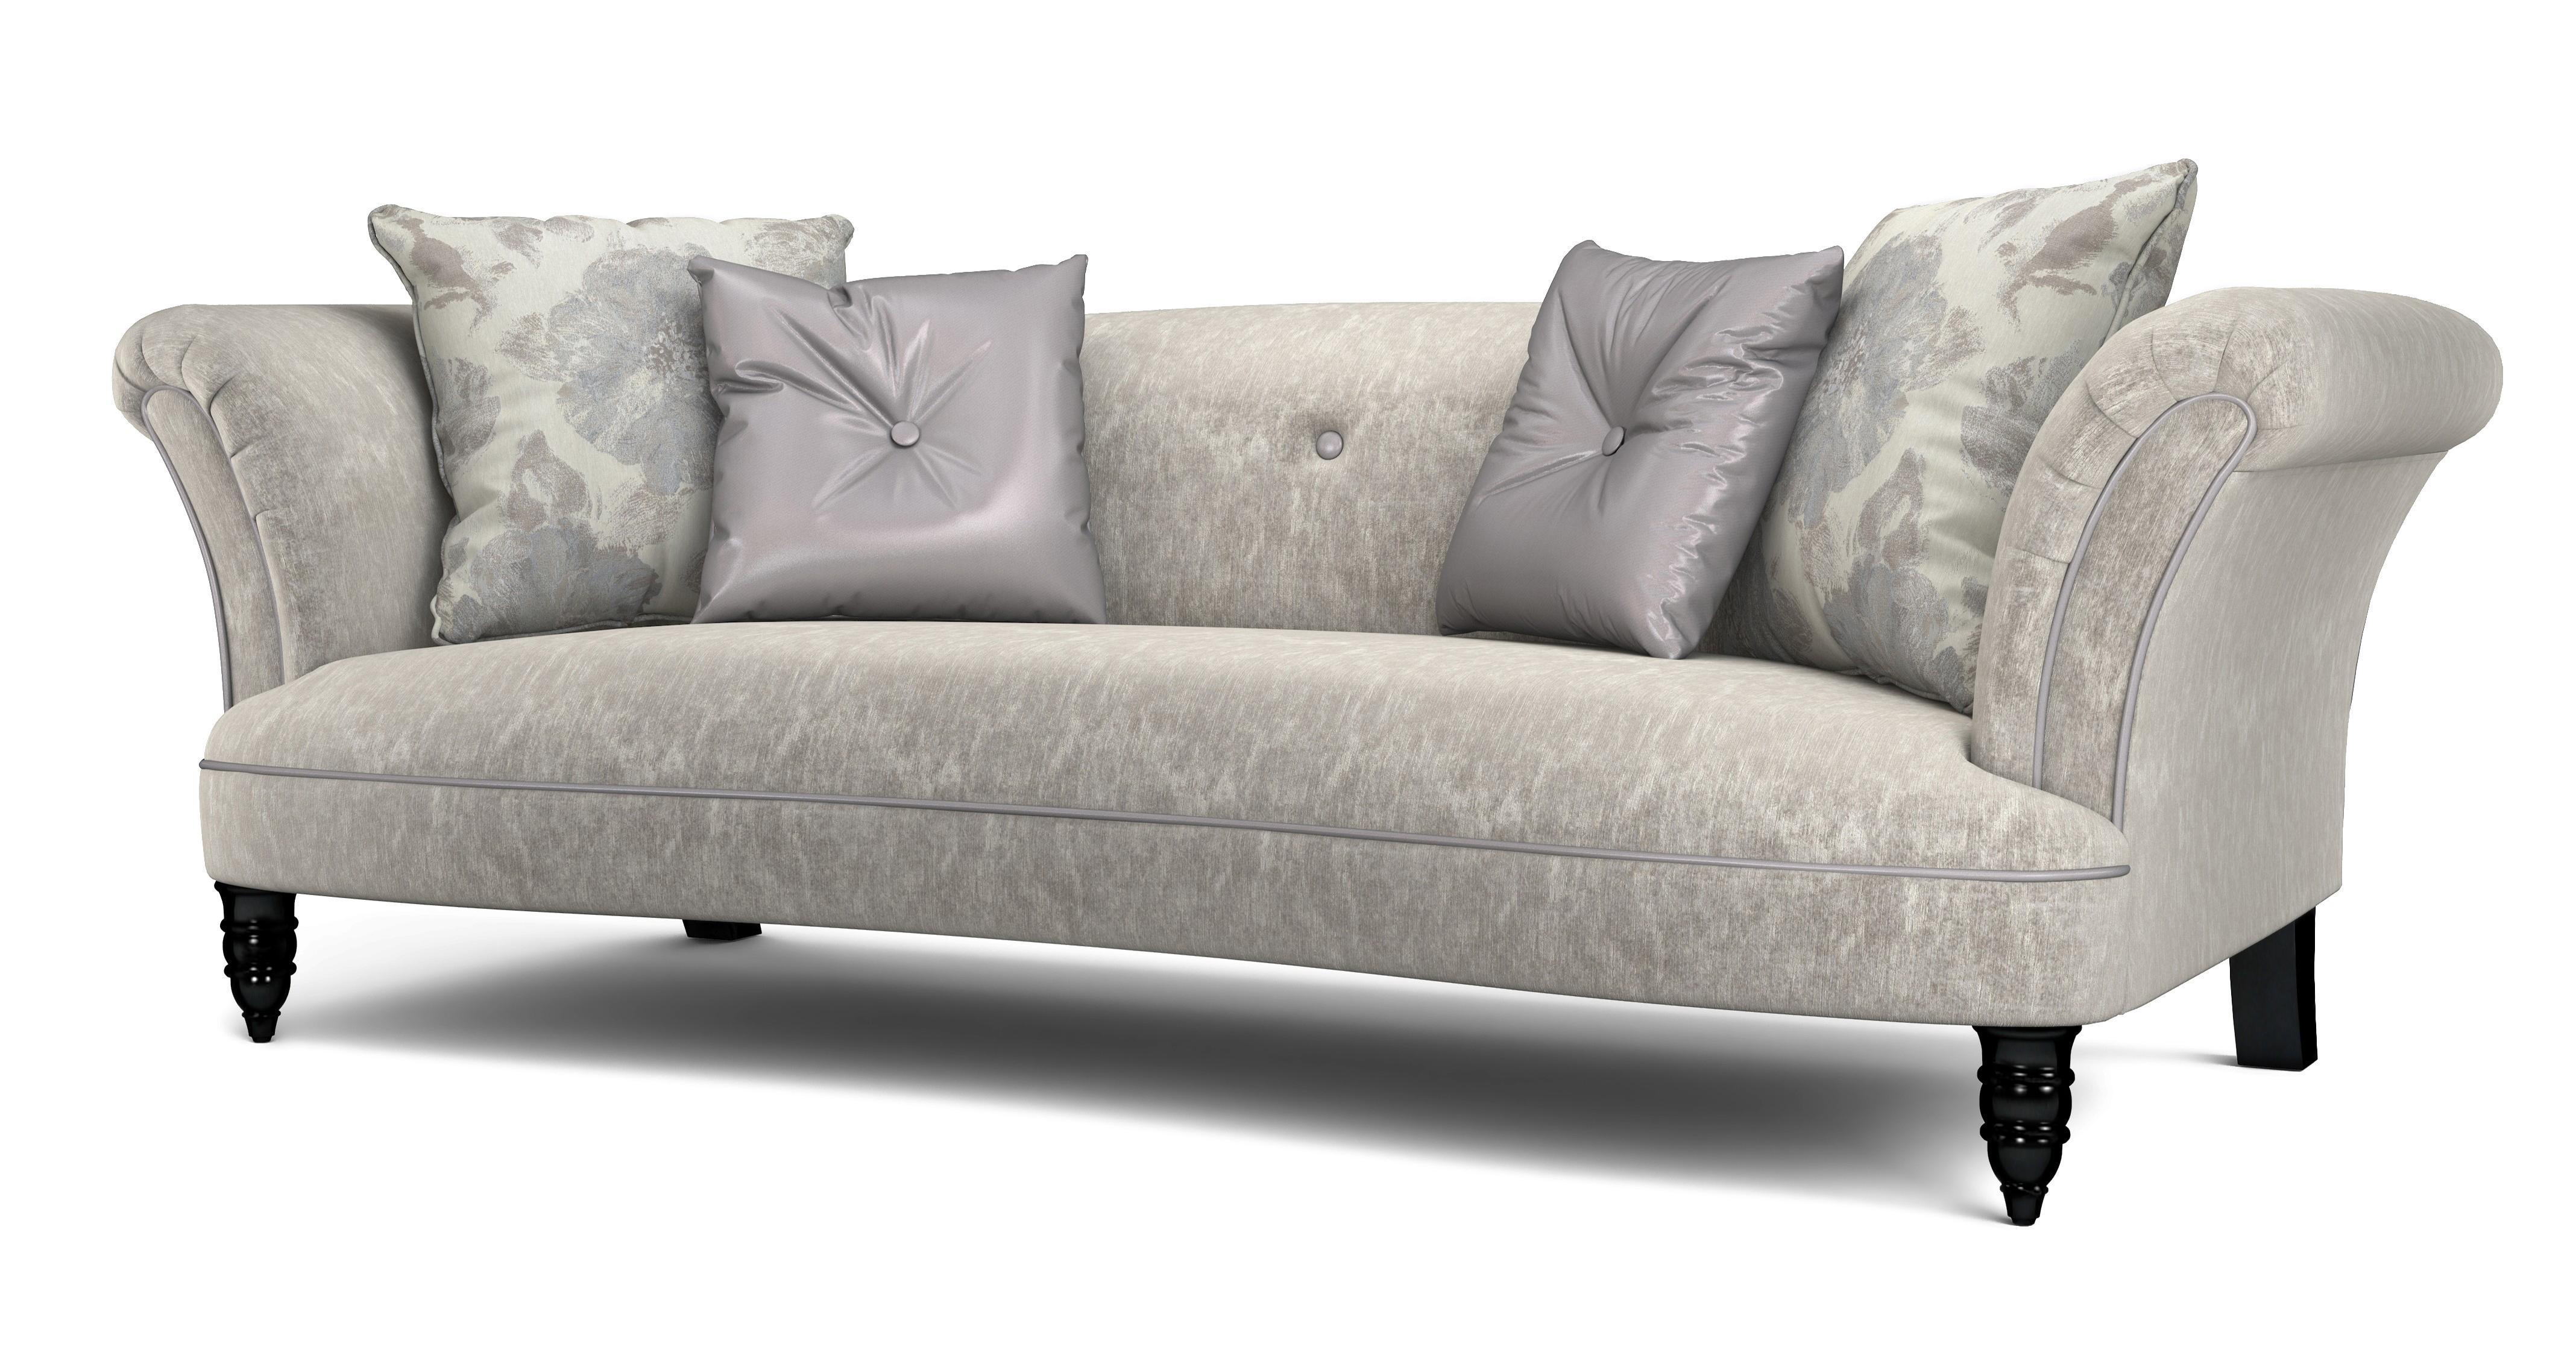 Concerto 4 Seater Sofa Concerto Dfs